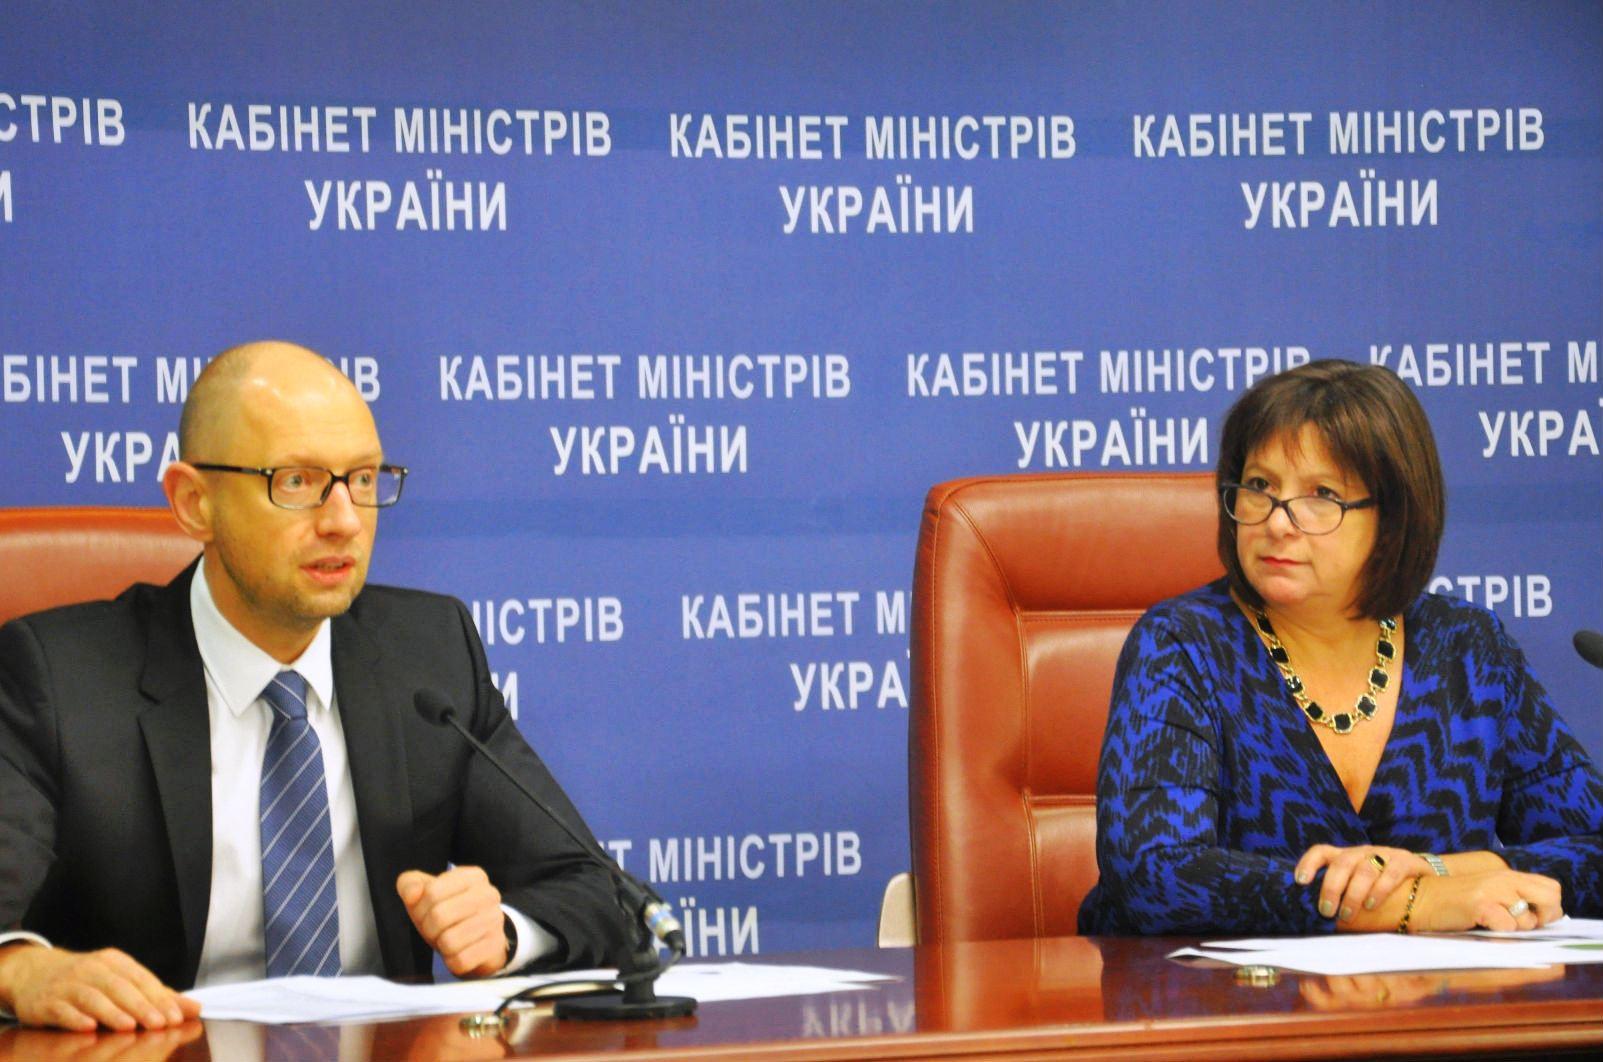 Jaresko: IMF may postpone new tranche if Ukraine's Cabinet changes